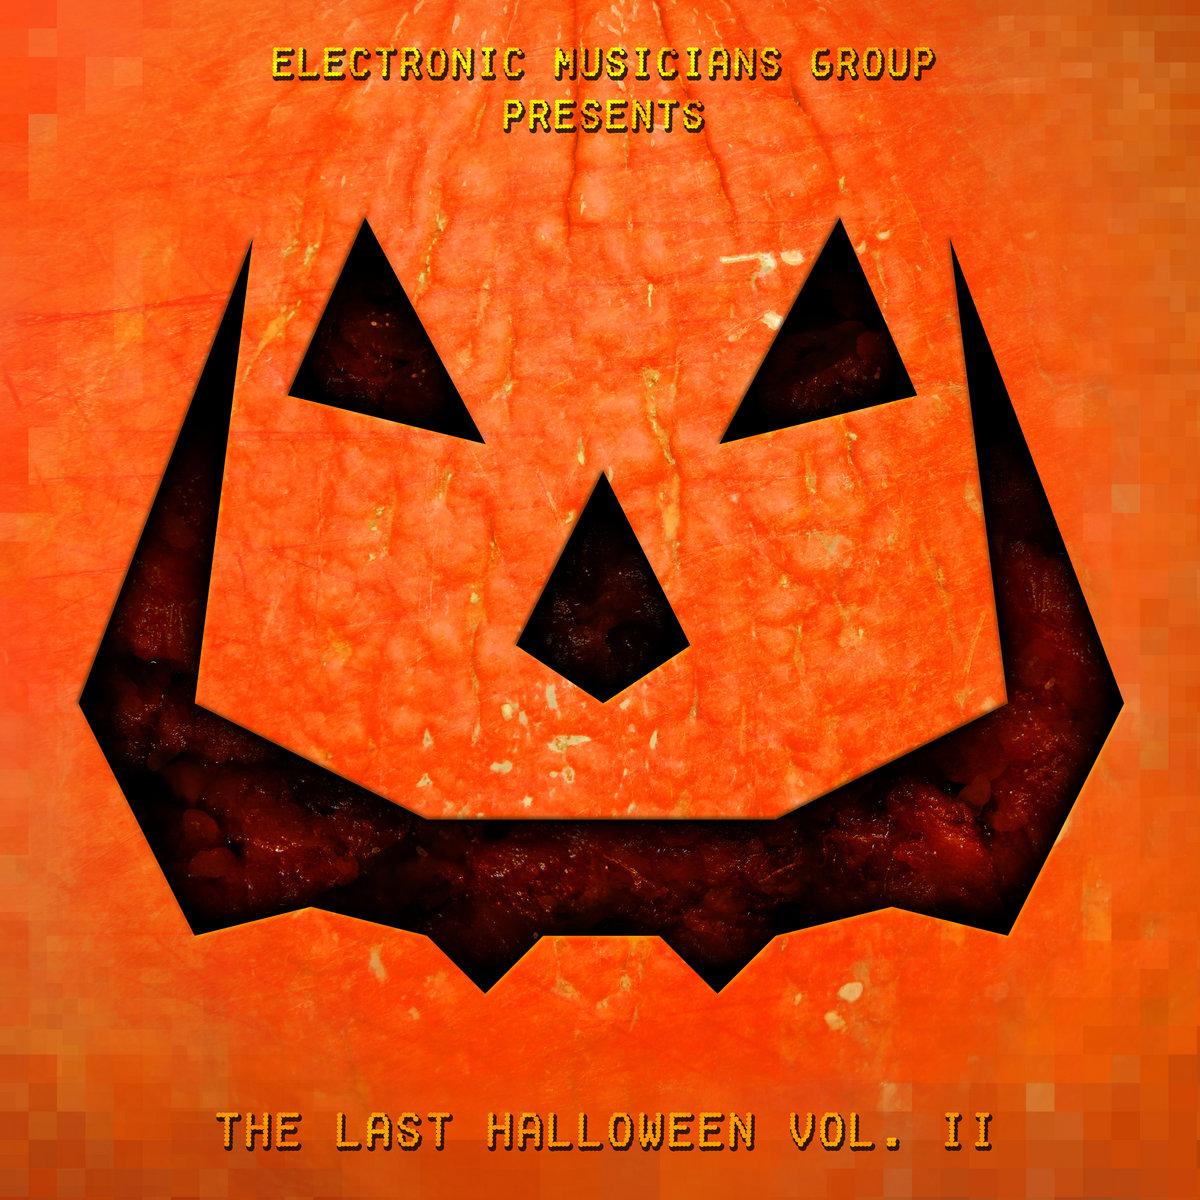 The Last Halloween Vol. II | Electronic Musicians Group